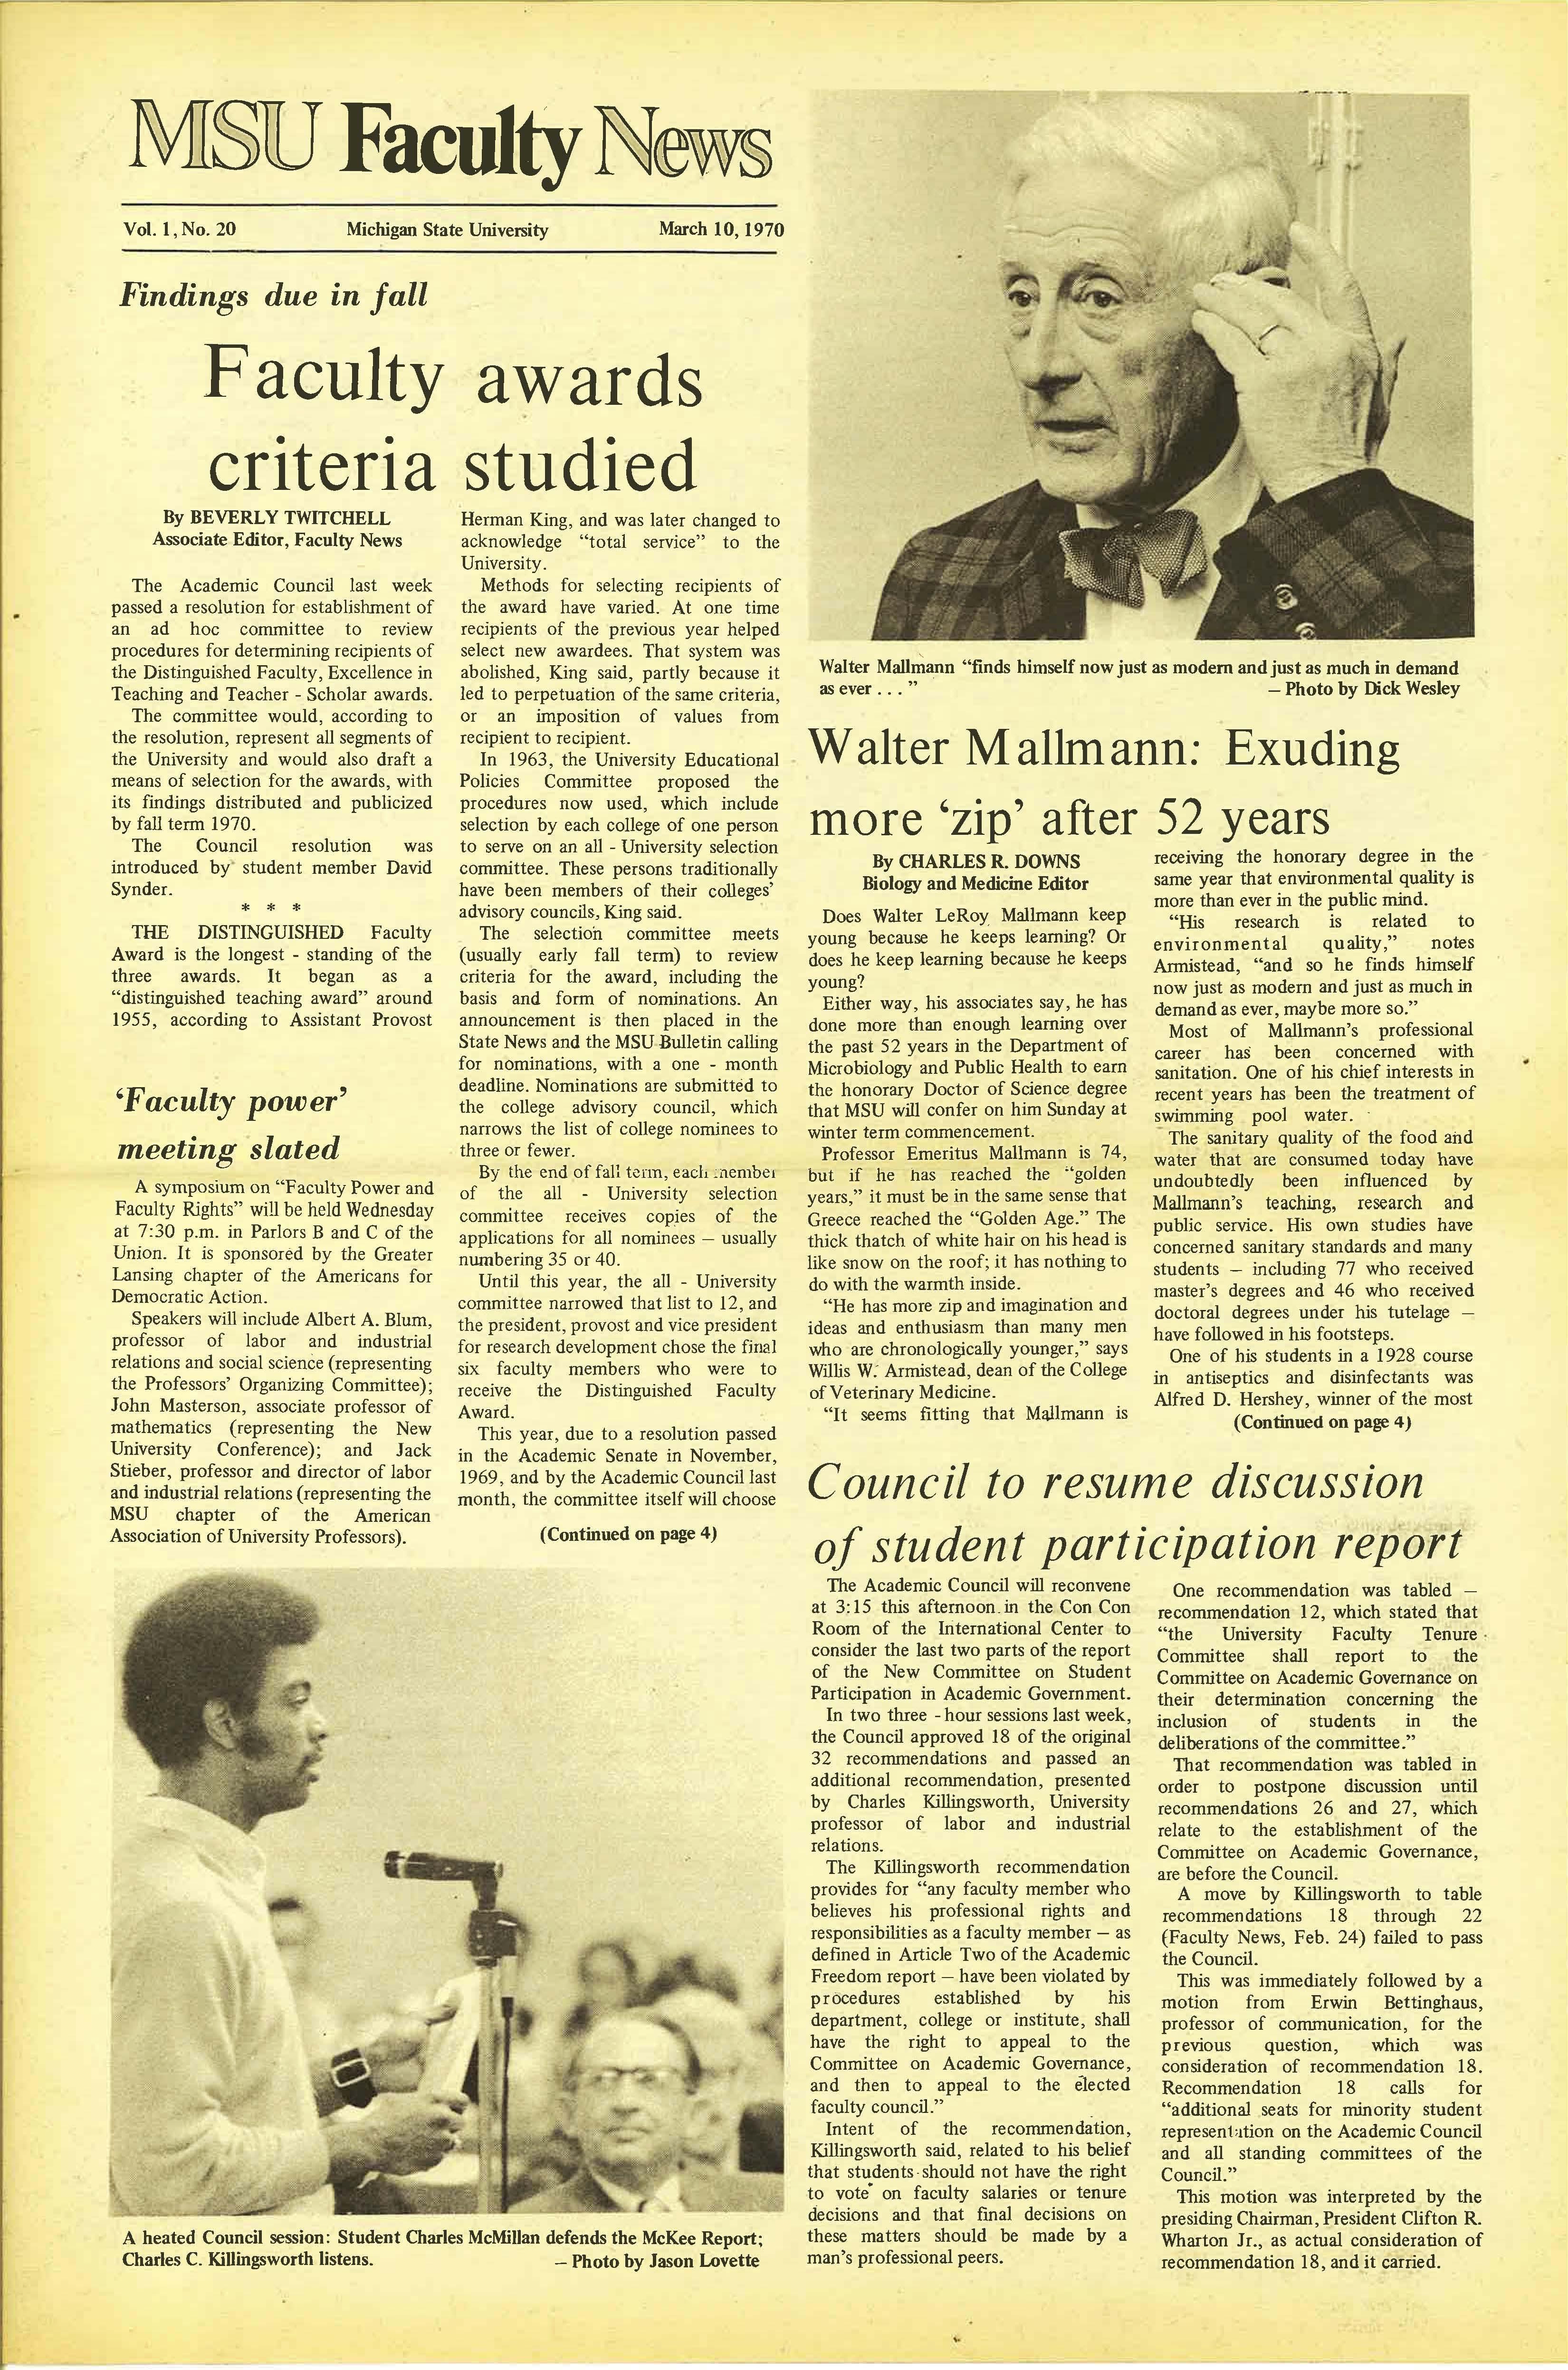 MSU News Bulletin, Vol. 2, No. 2, October 6, 1970